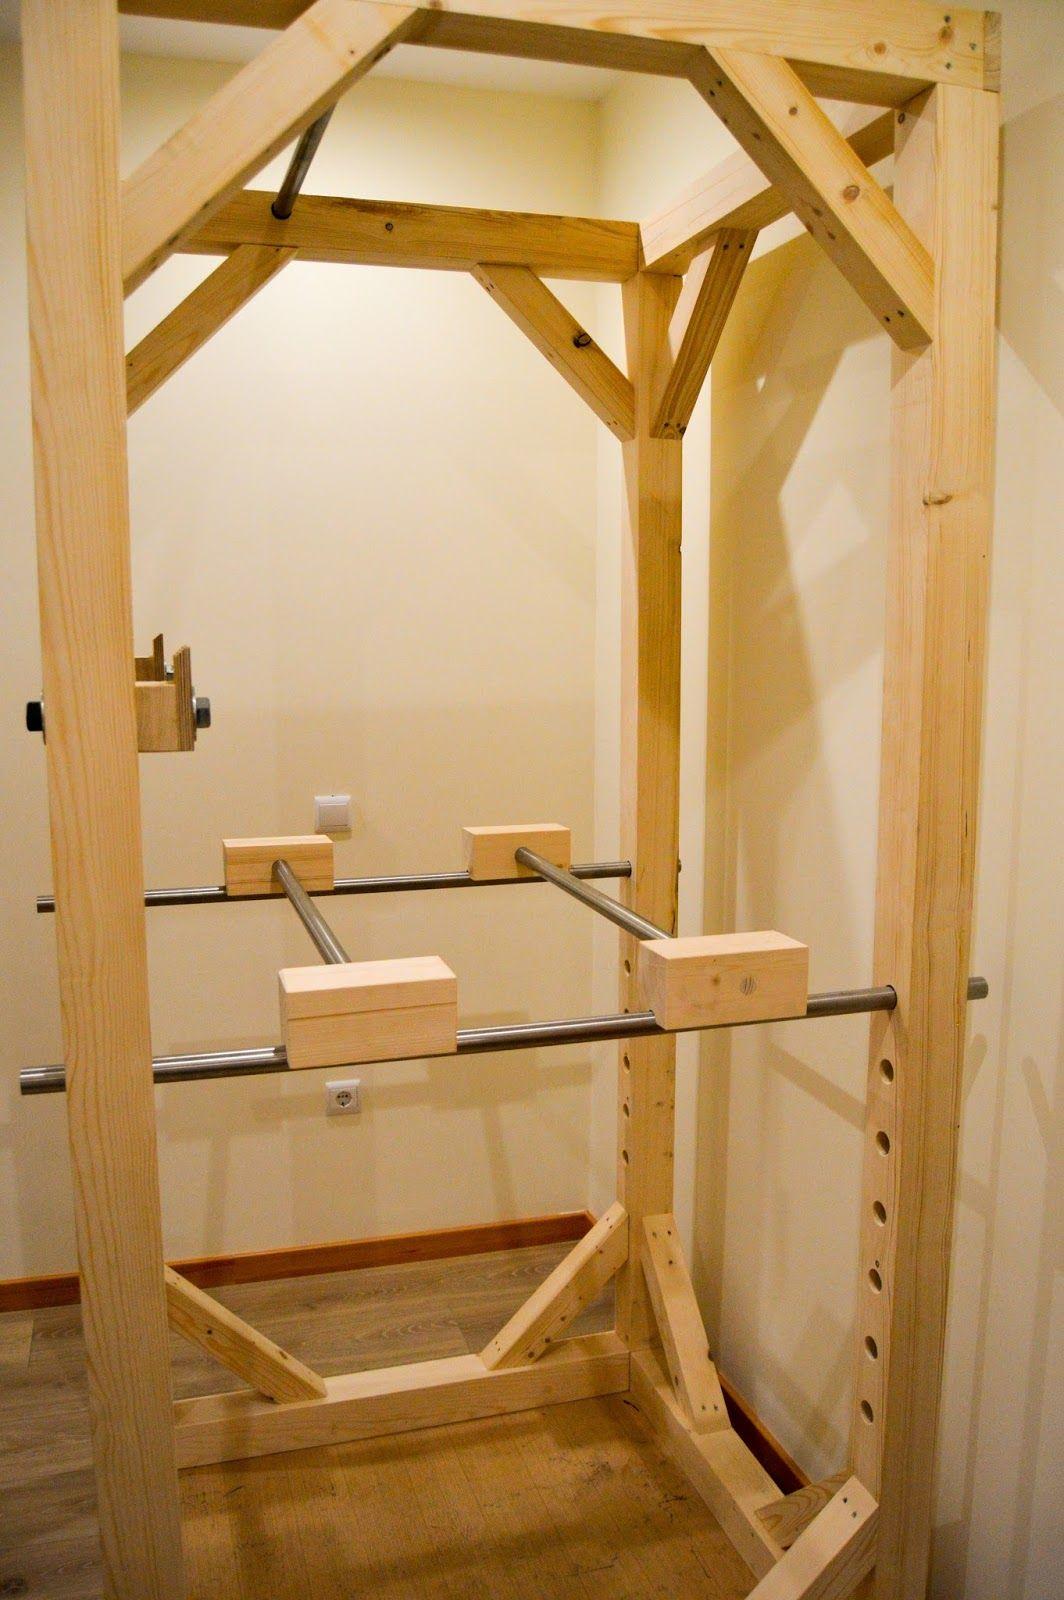 DIY Carlos: My Homemade Power Rack